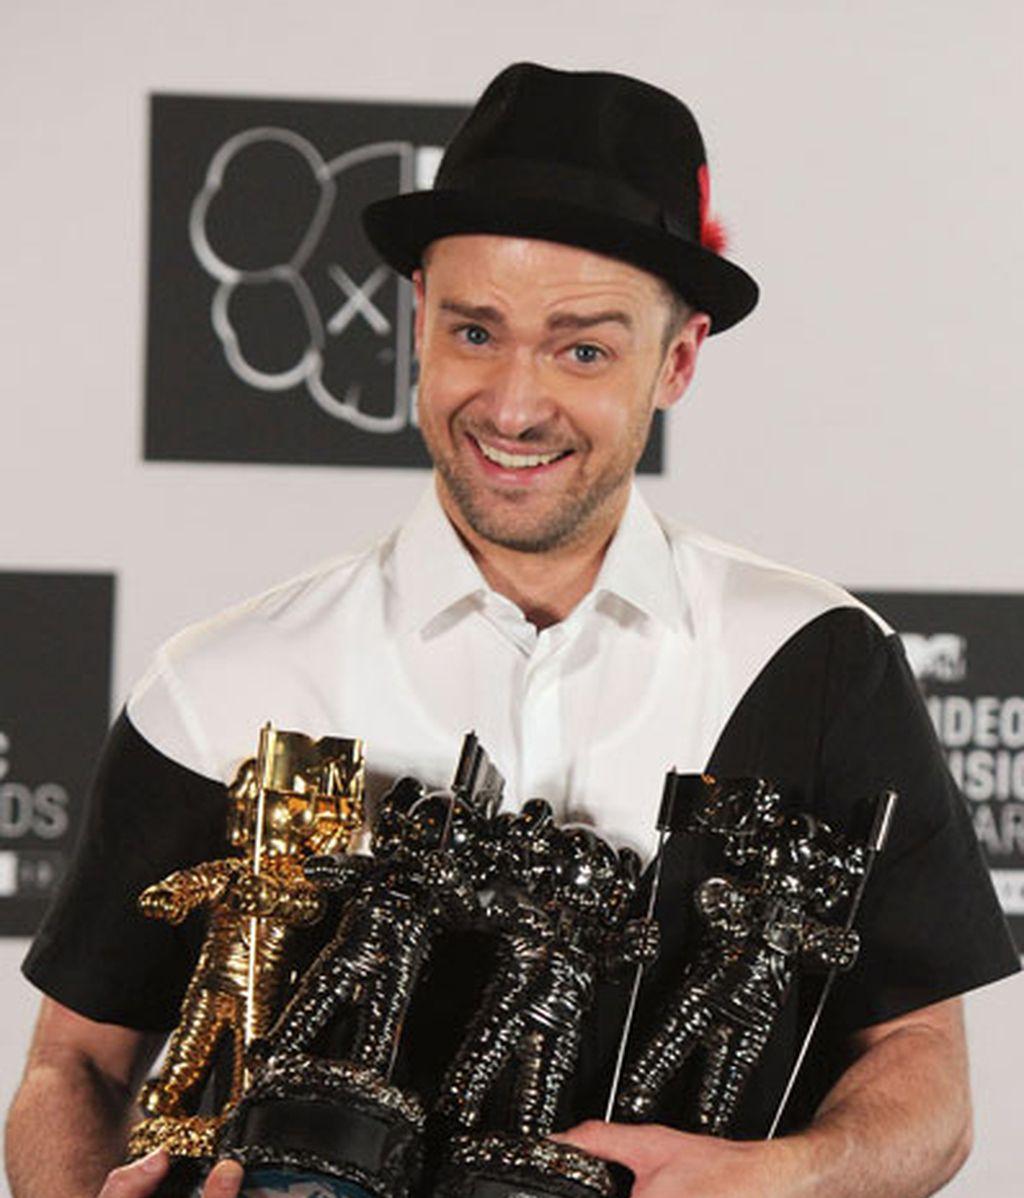 Justin Timberlake VMA 2013